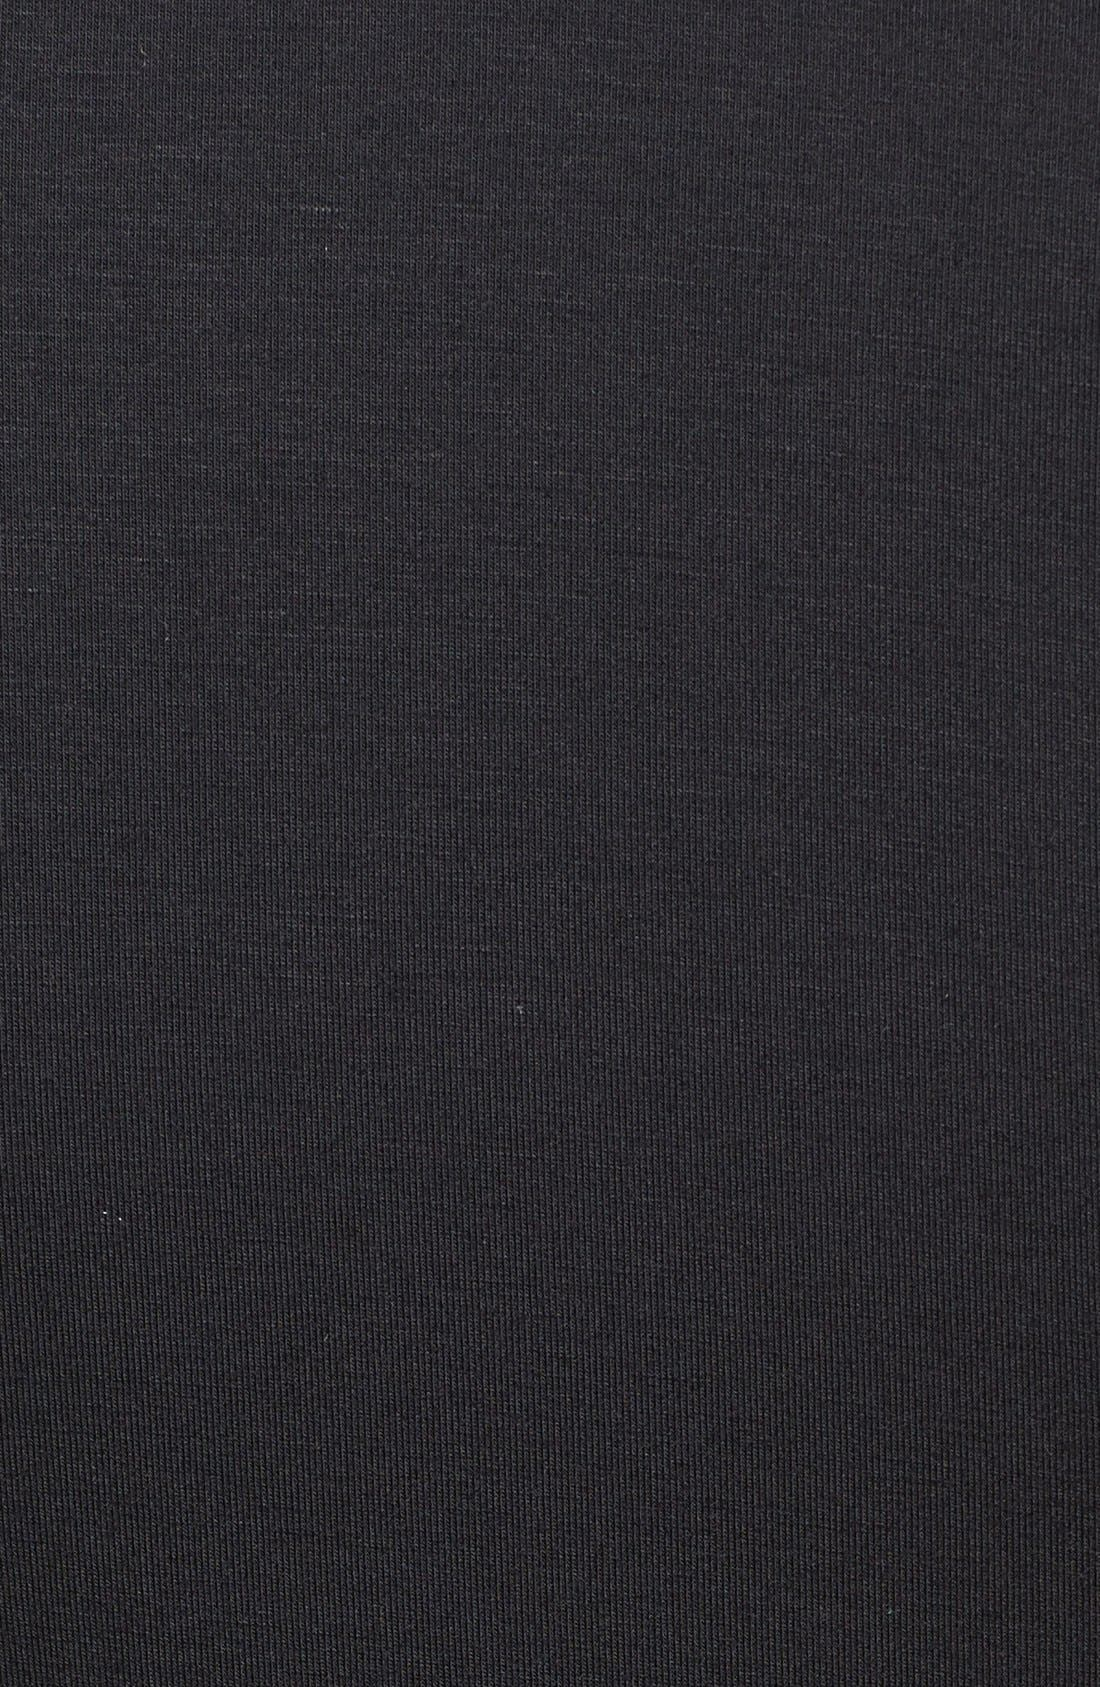 Alternate Image 3  - Chaus Cap Sleeve Top